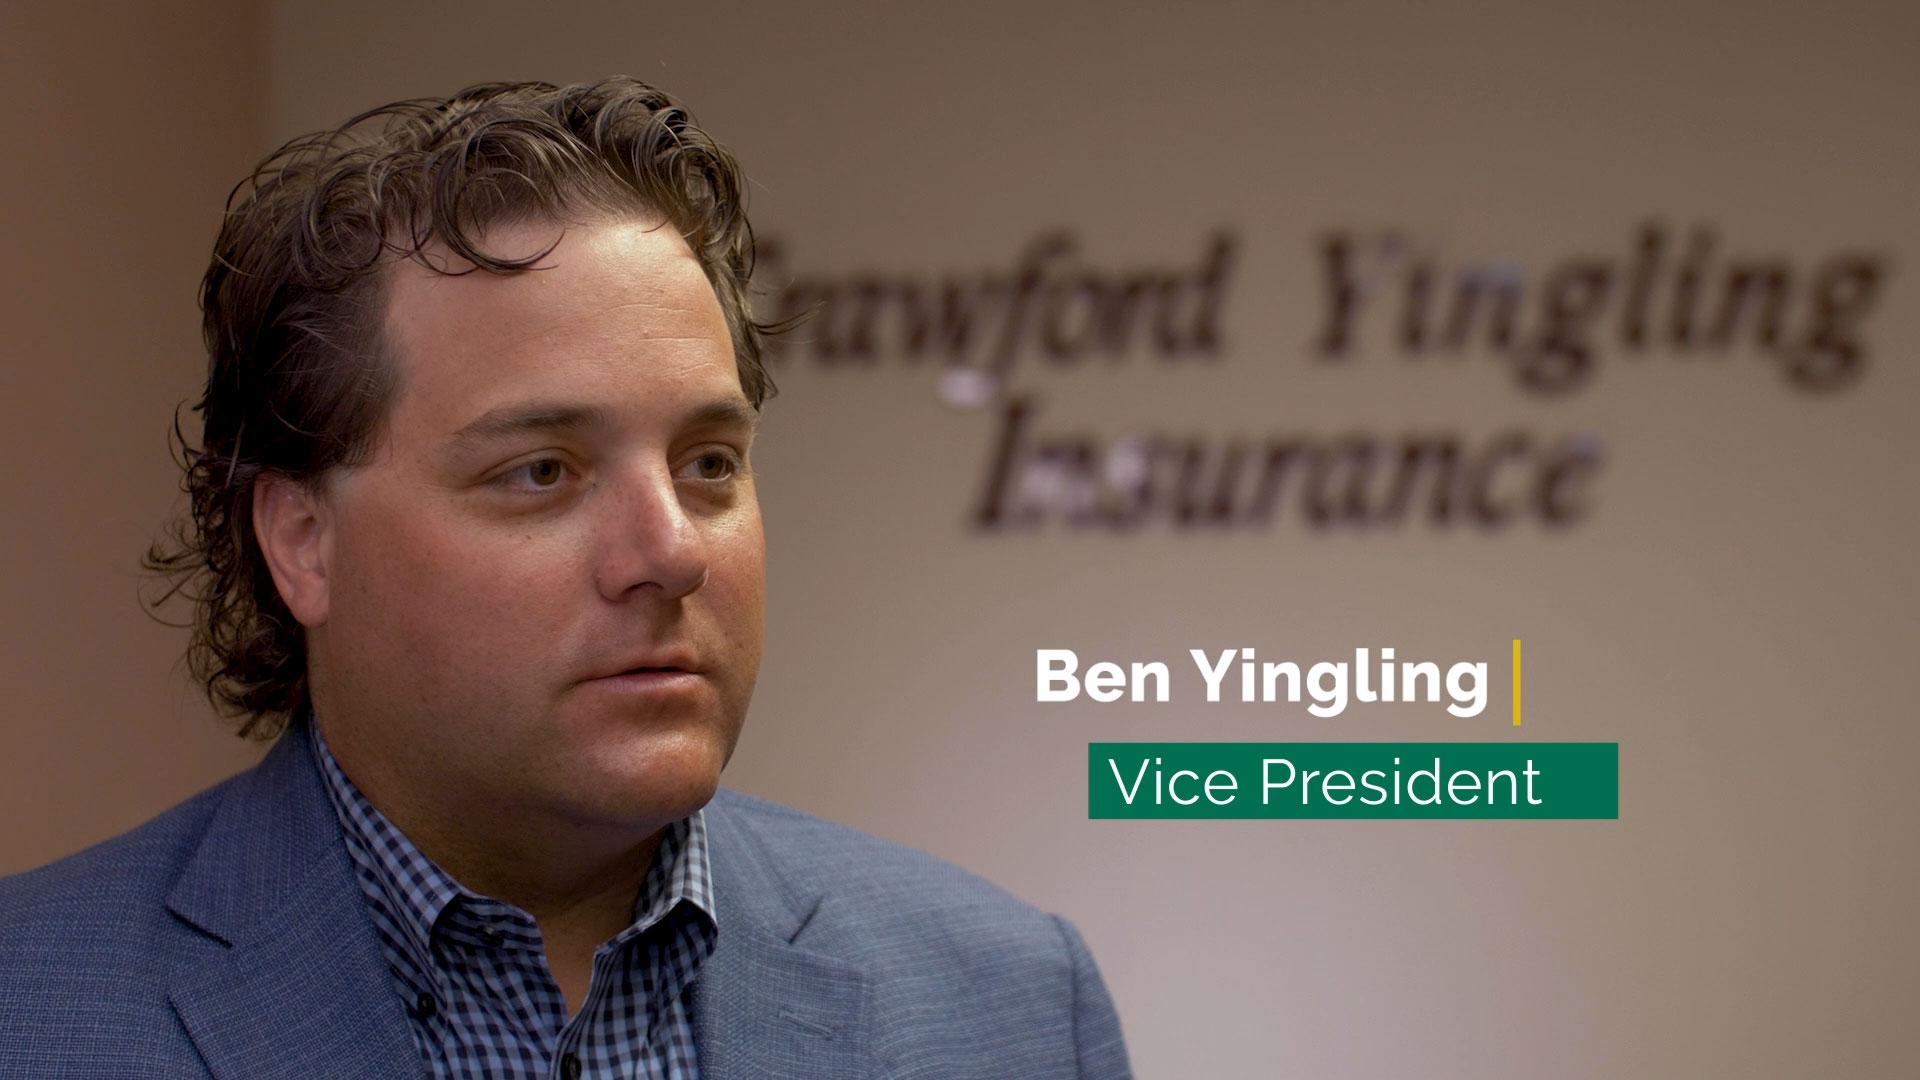 ben-yingling-vice-president-crawford-yingling-insurance